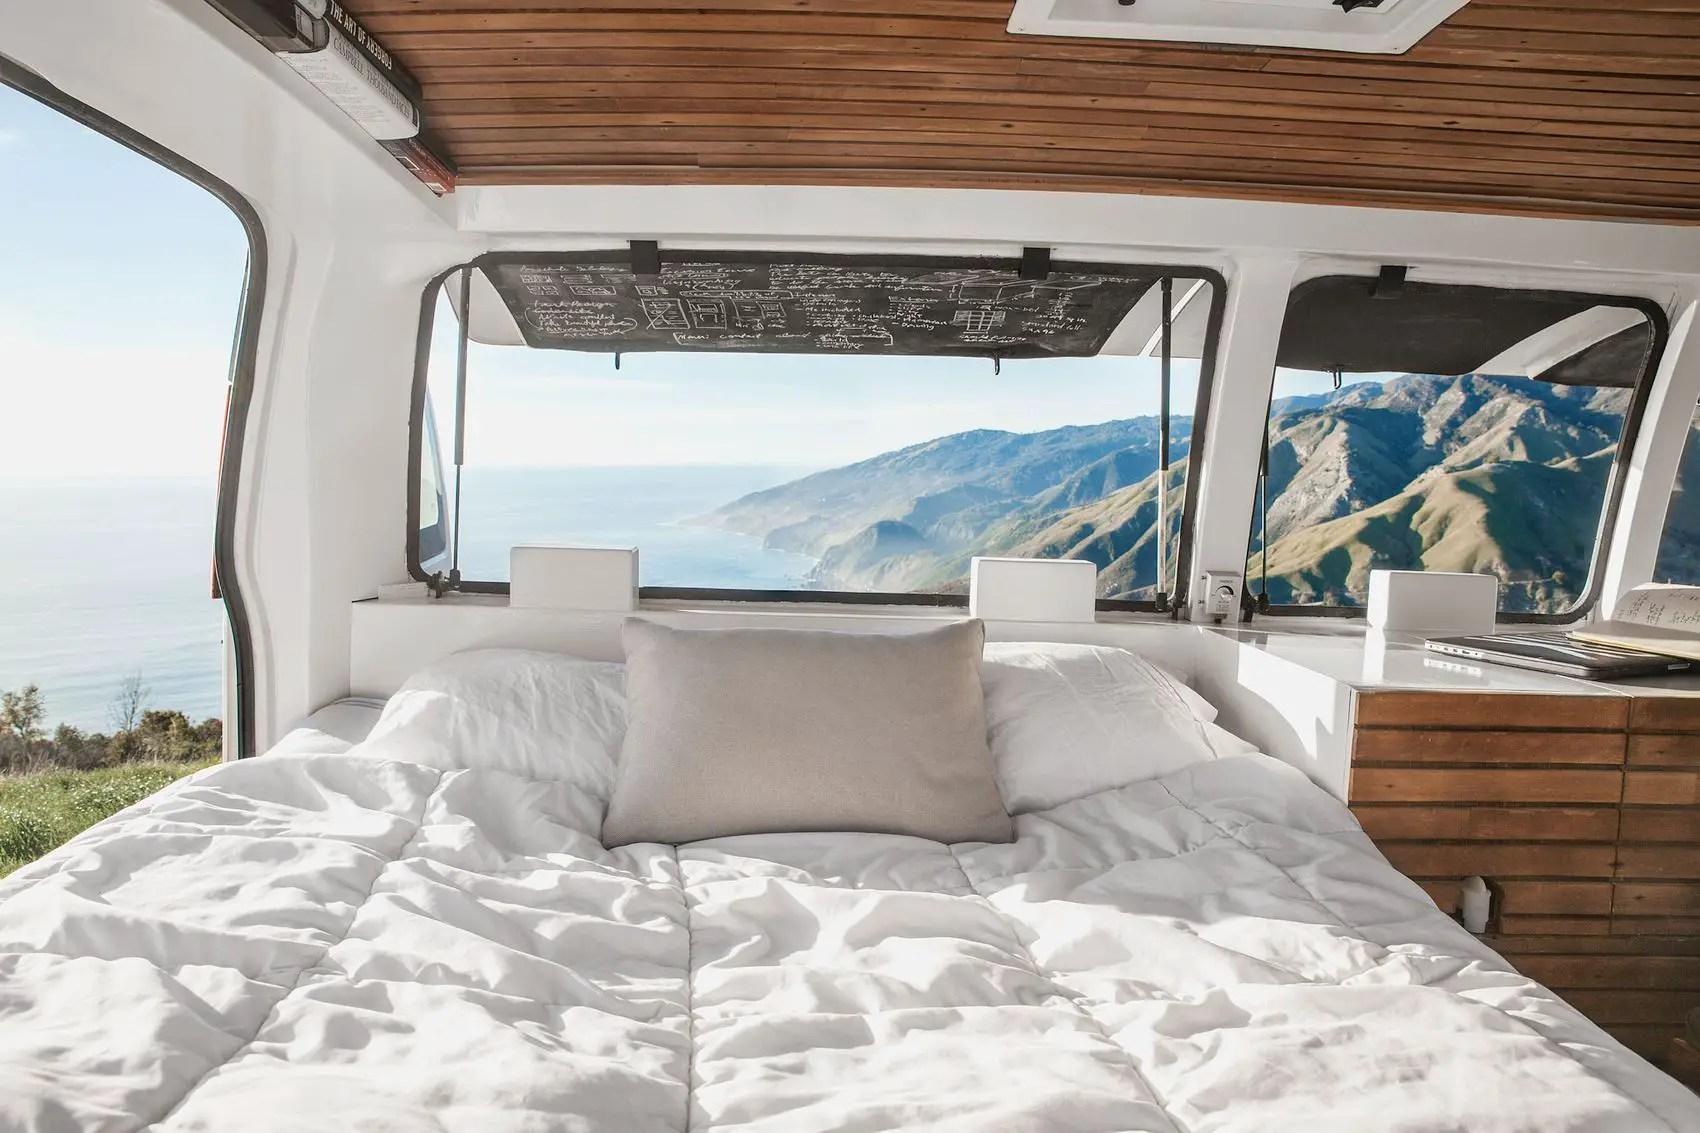 Camper Van Interior Ideas 65